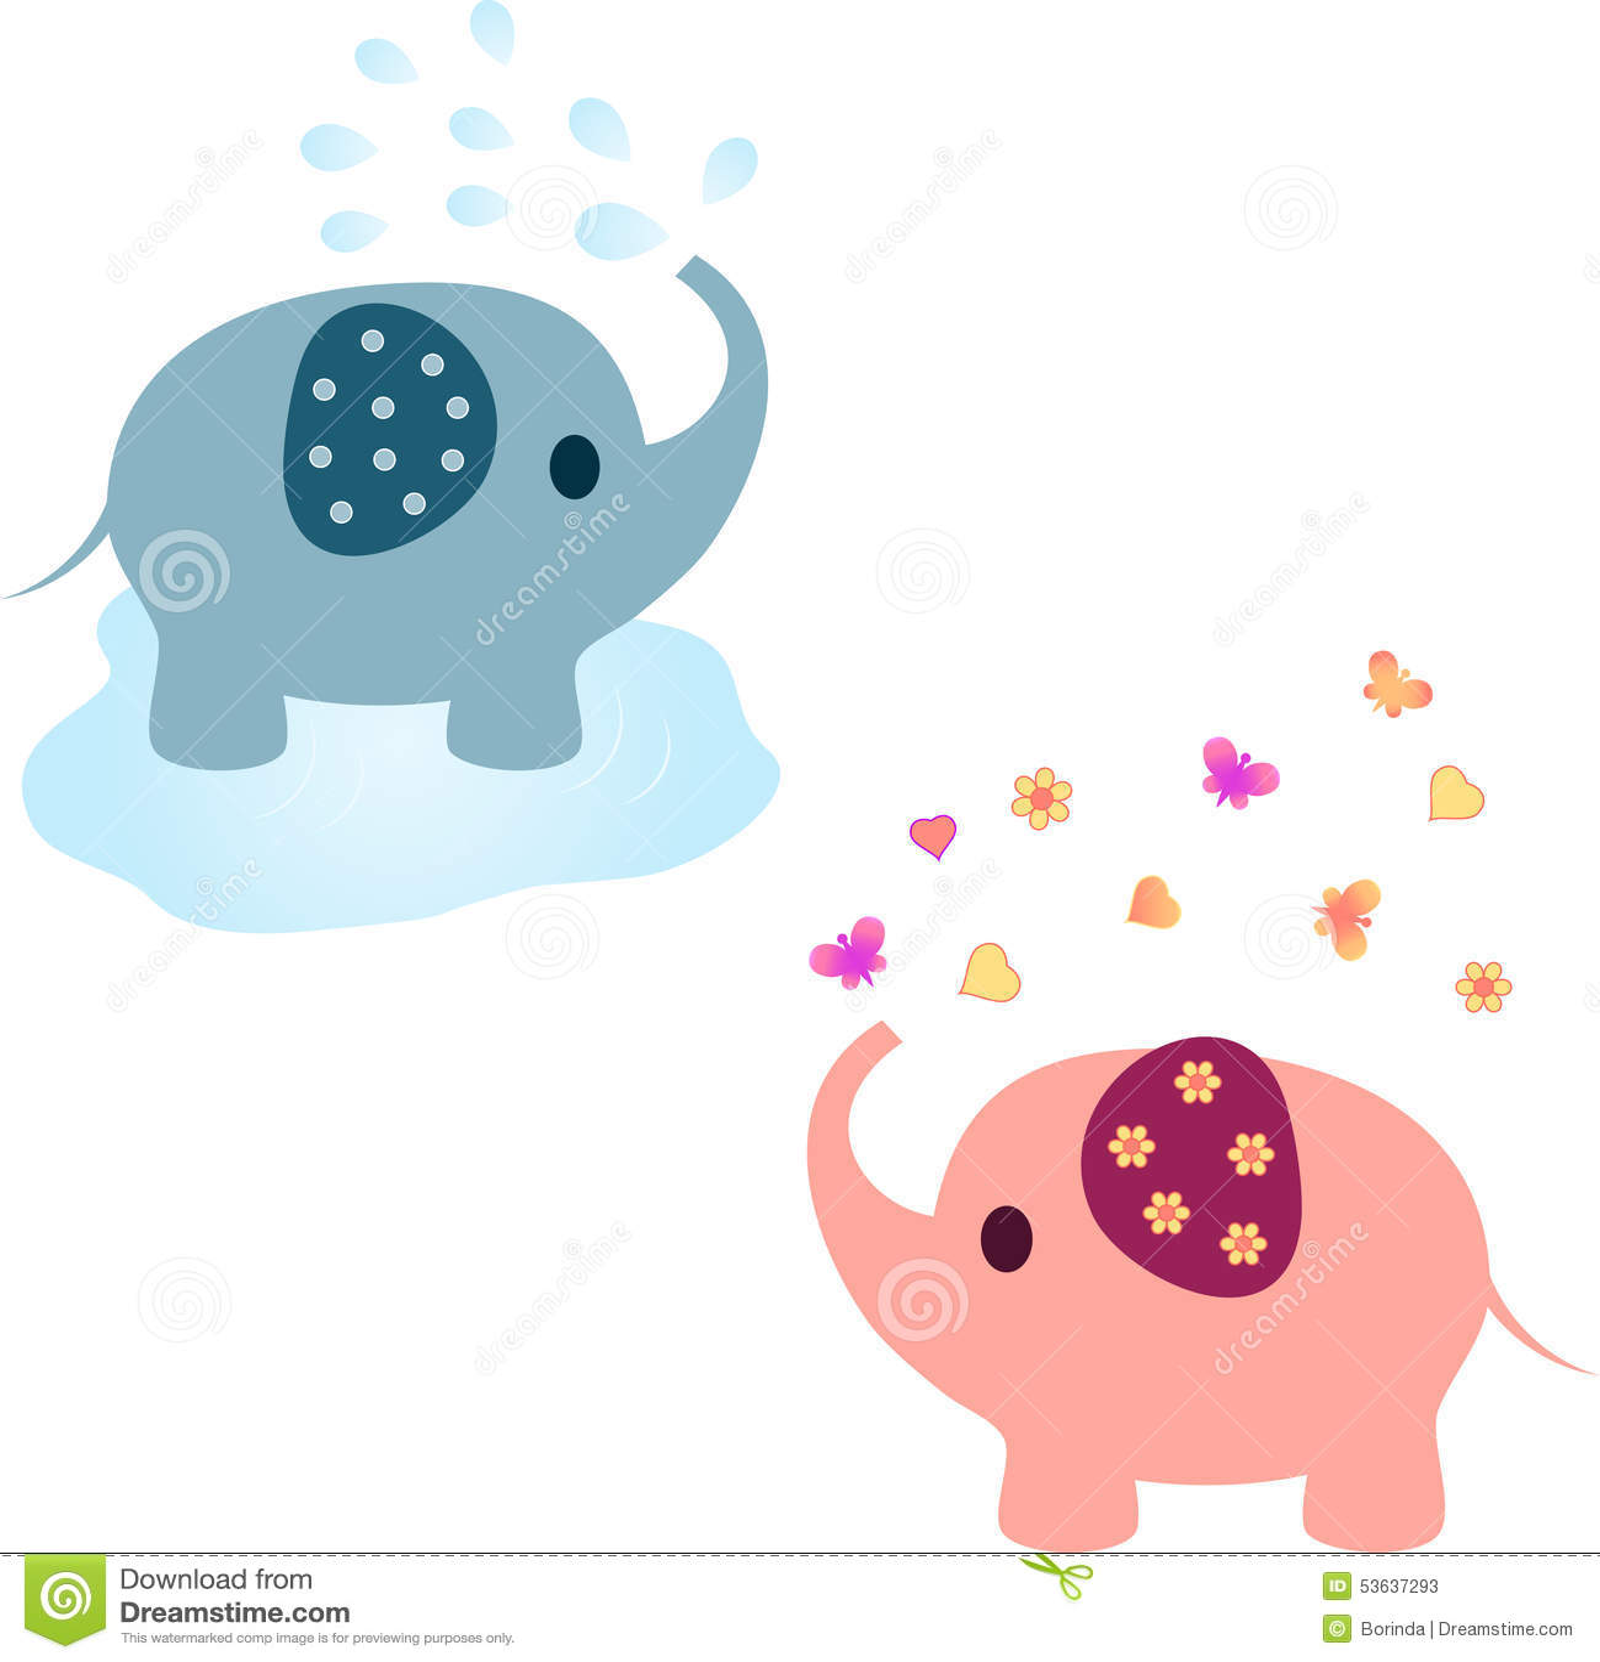 Elephant Illustrations, Pink Elephant, Blue Elephant Stock